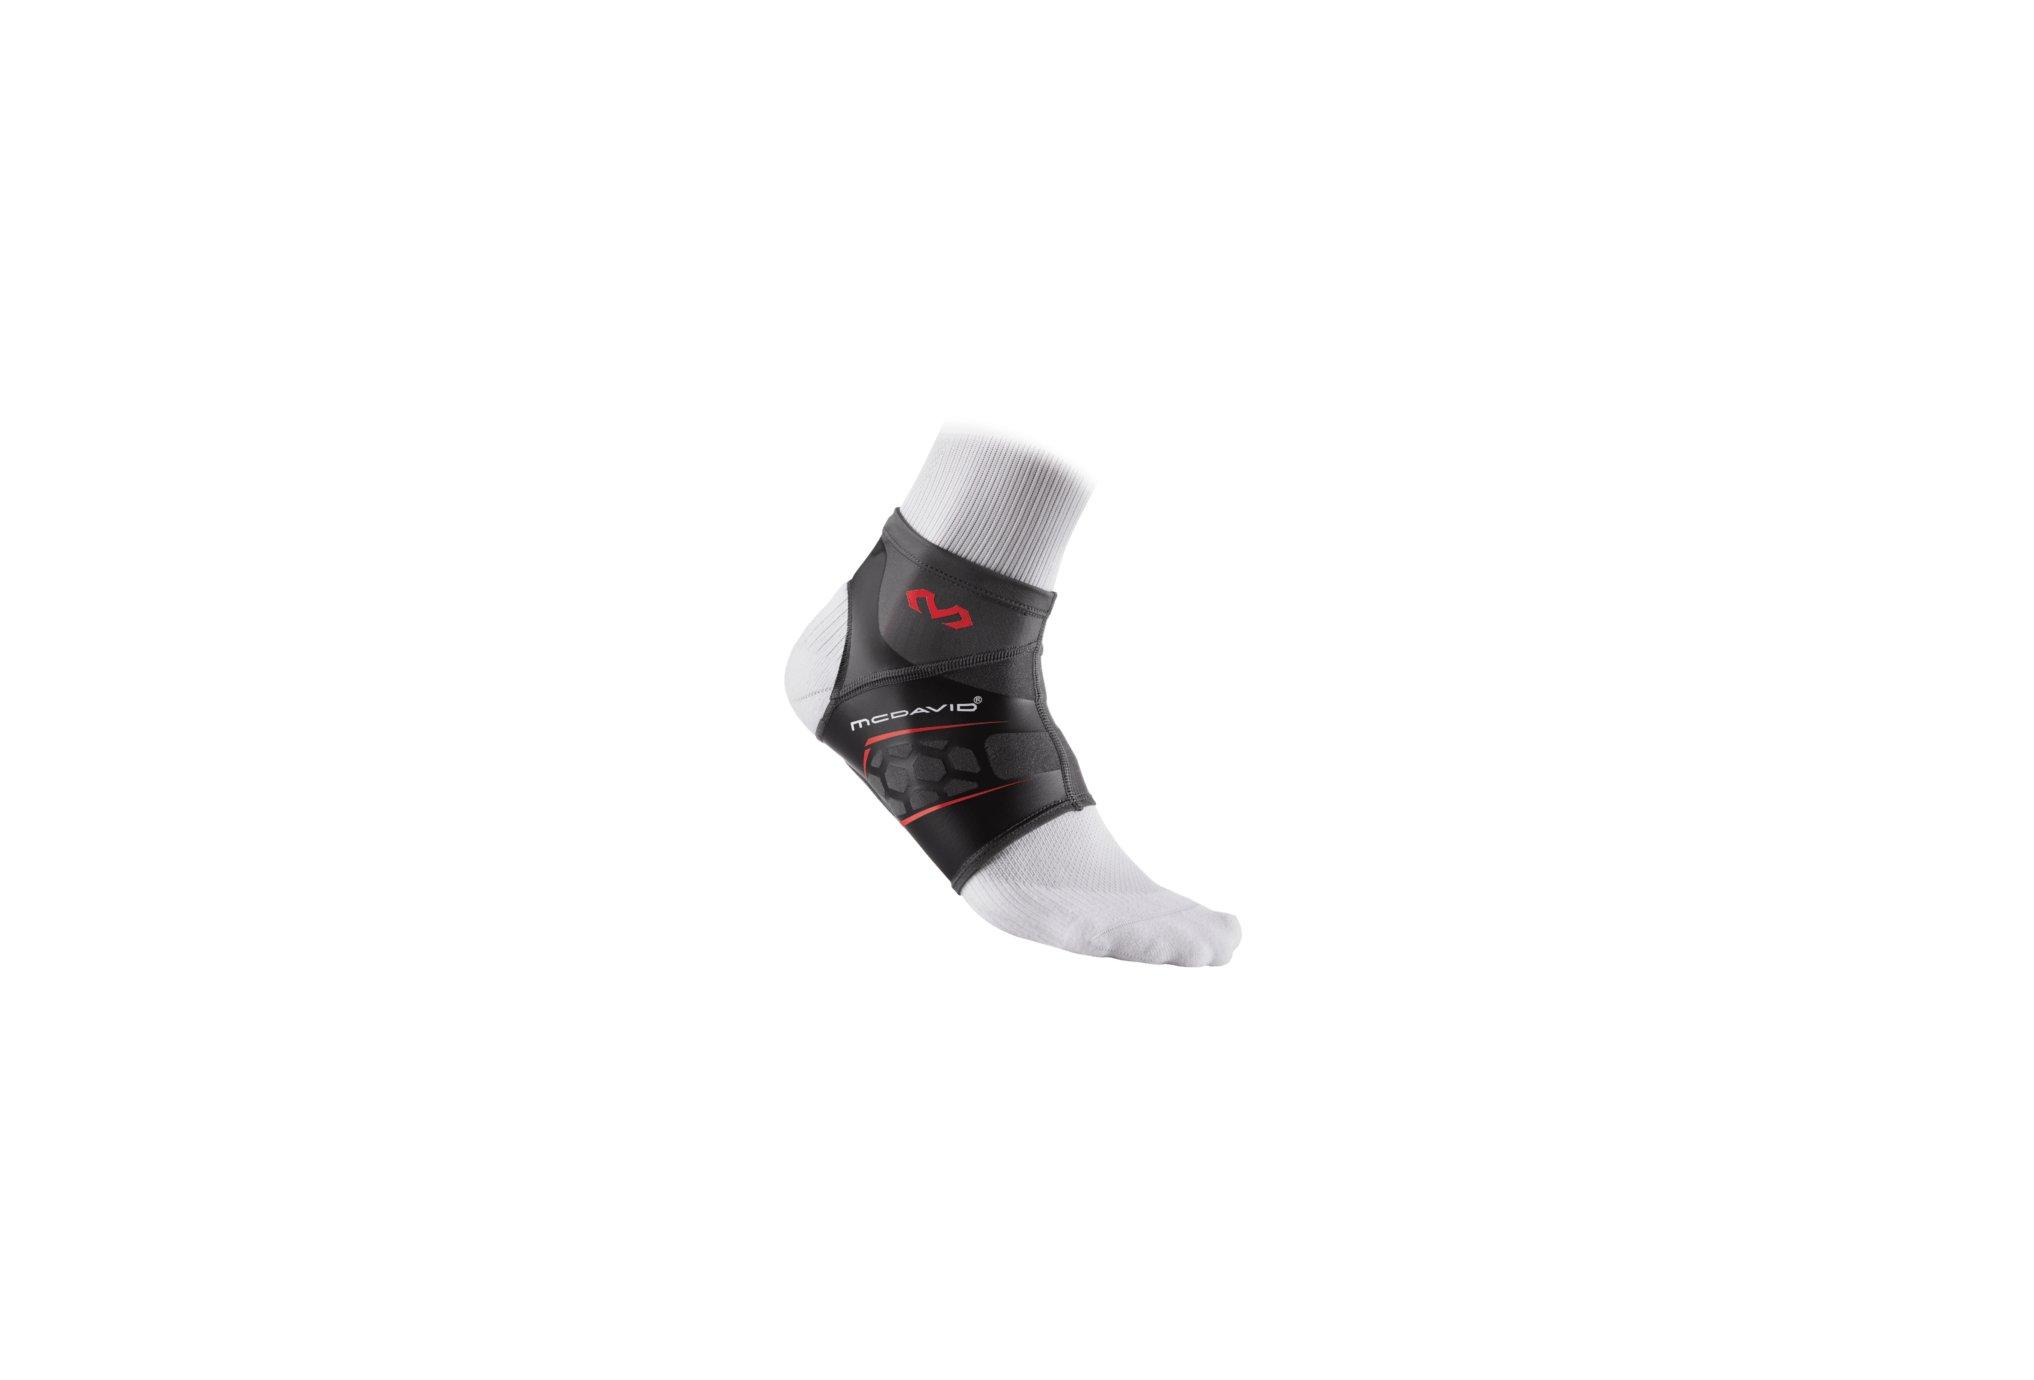 McDavid Compression pour aponévrose pied gauche Protection musculaire & articulaire